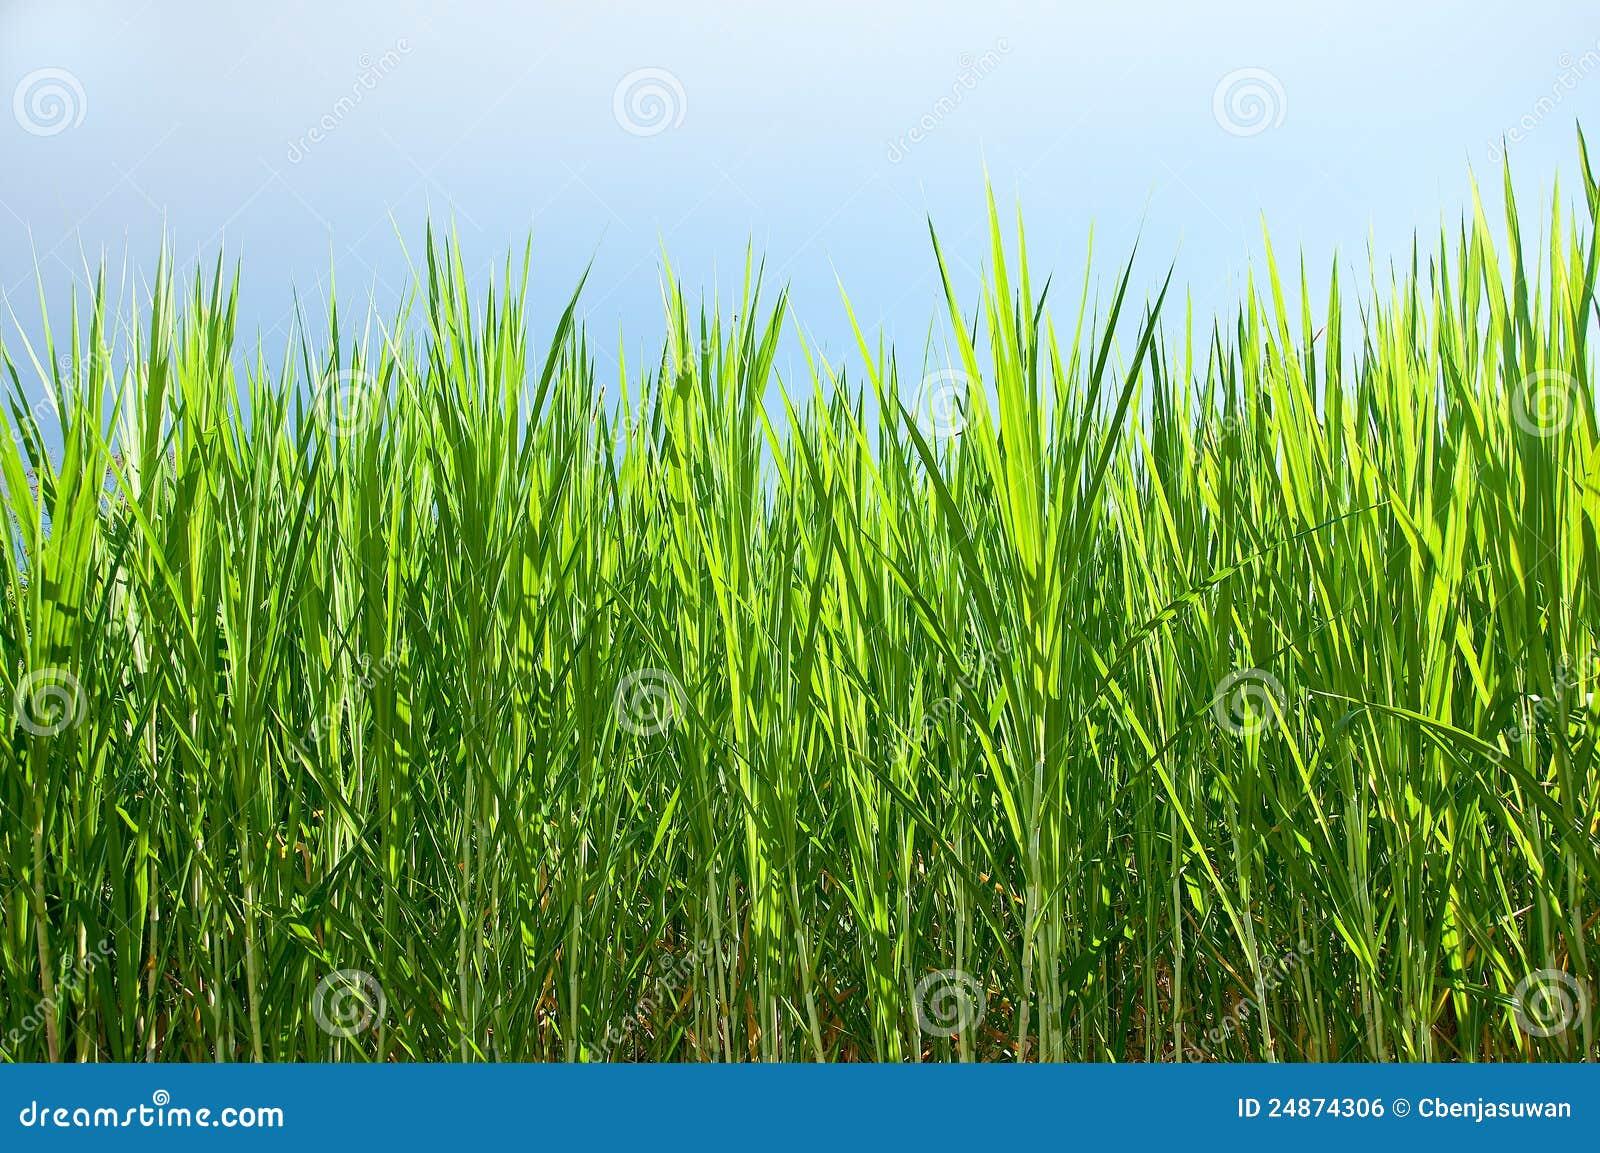 La plante verte de la canne sucre for La plante verte